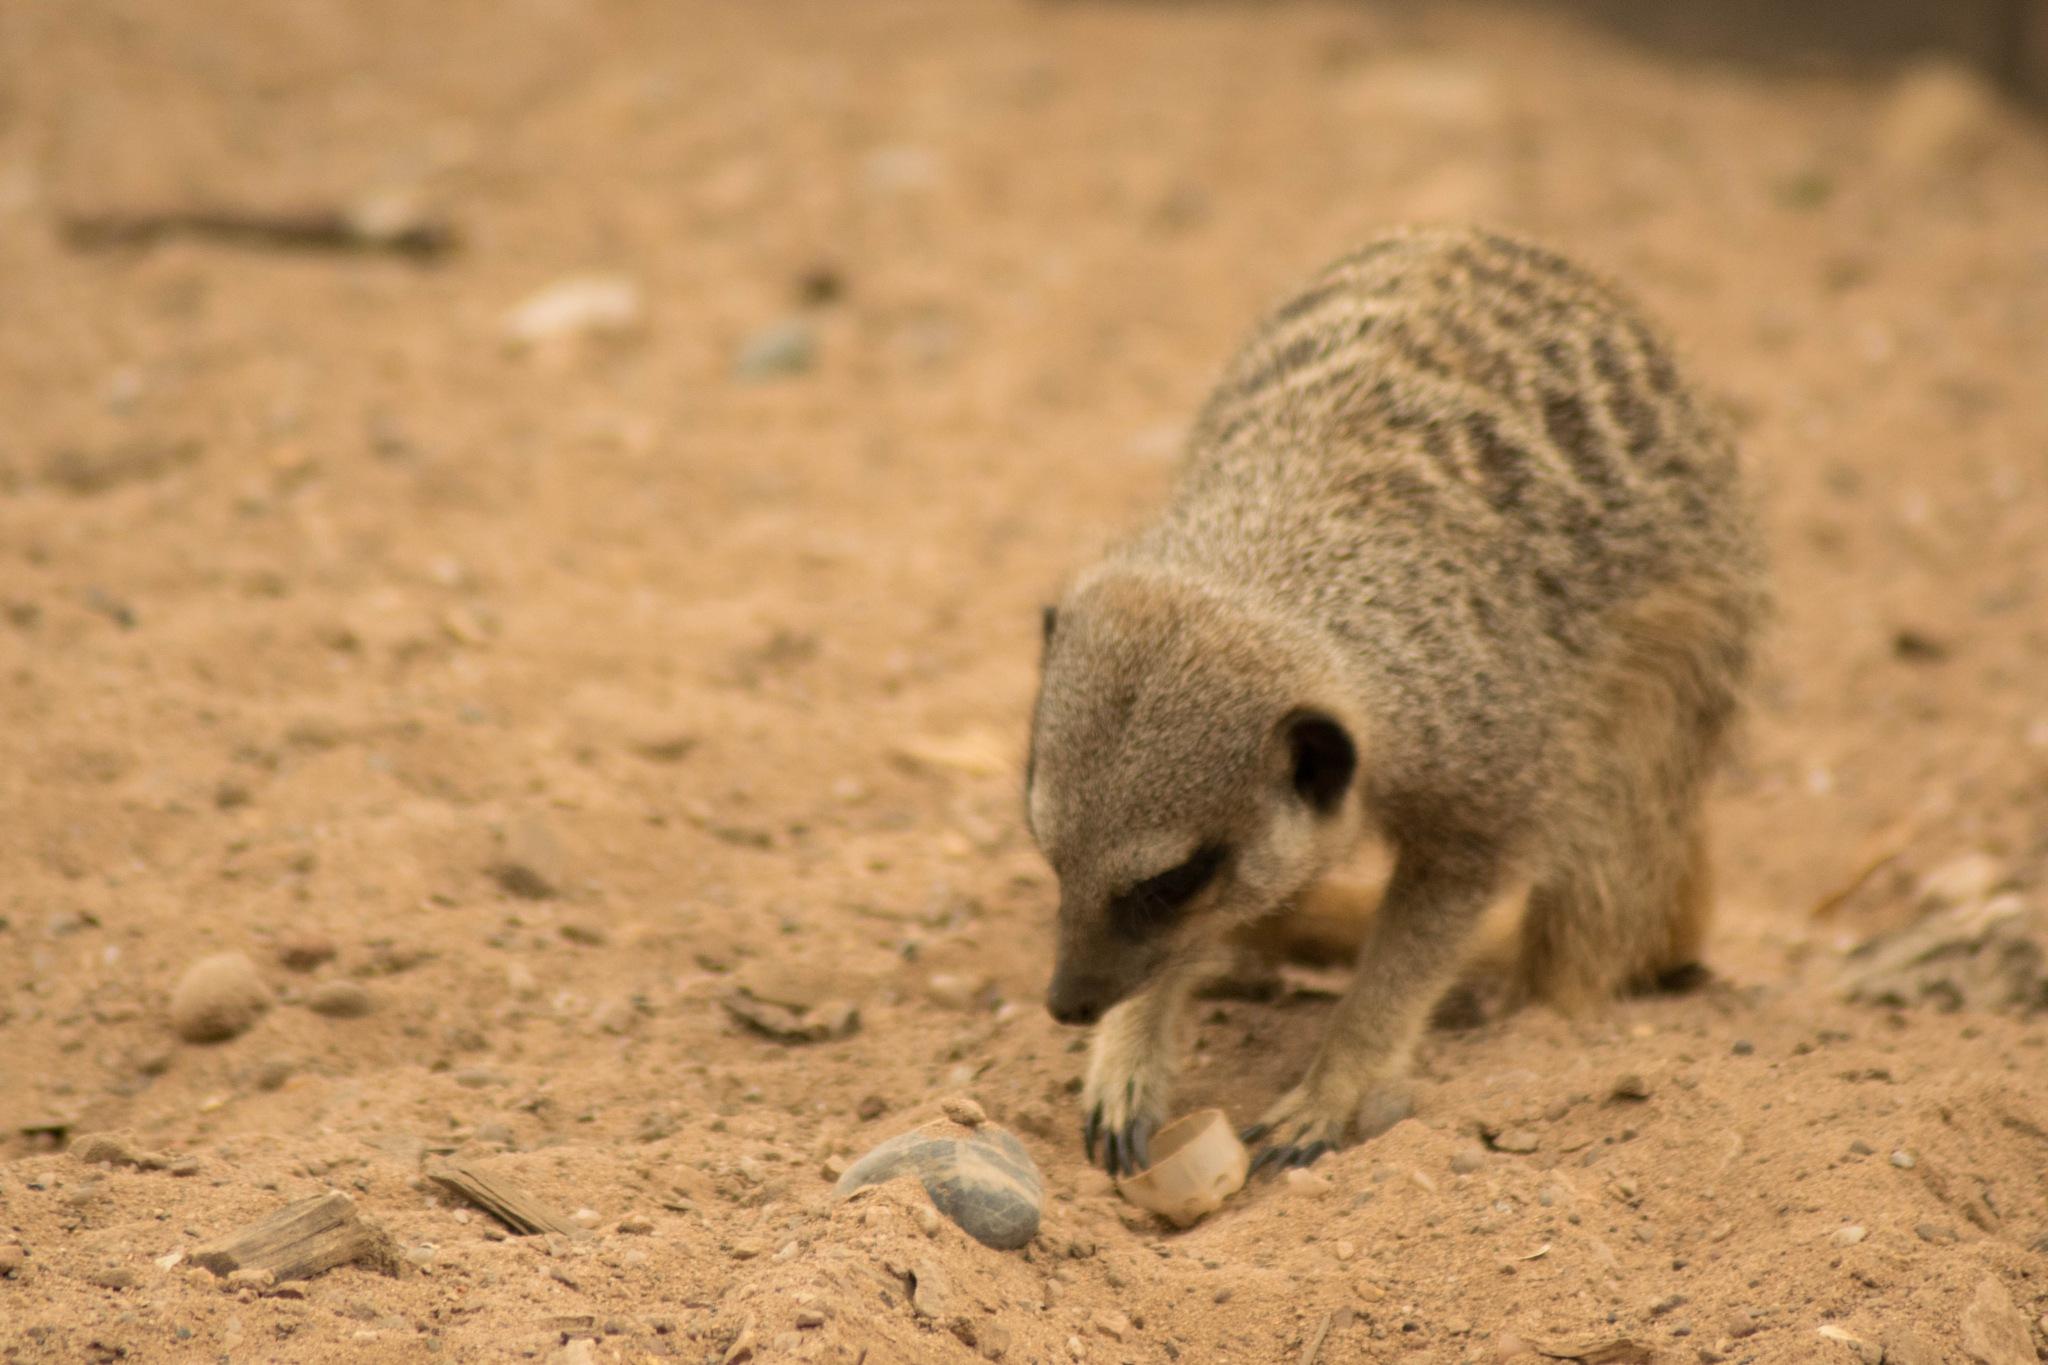 Meerkat and Bottlecap by Dan Waters